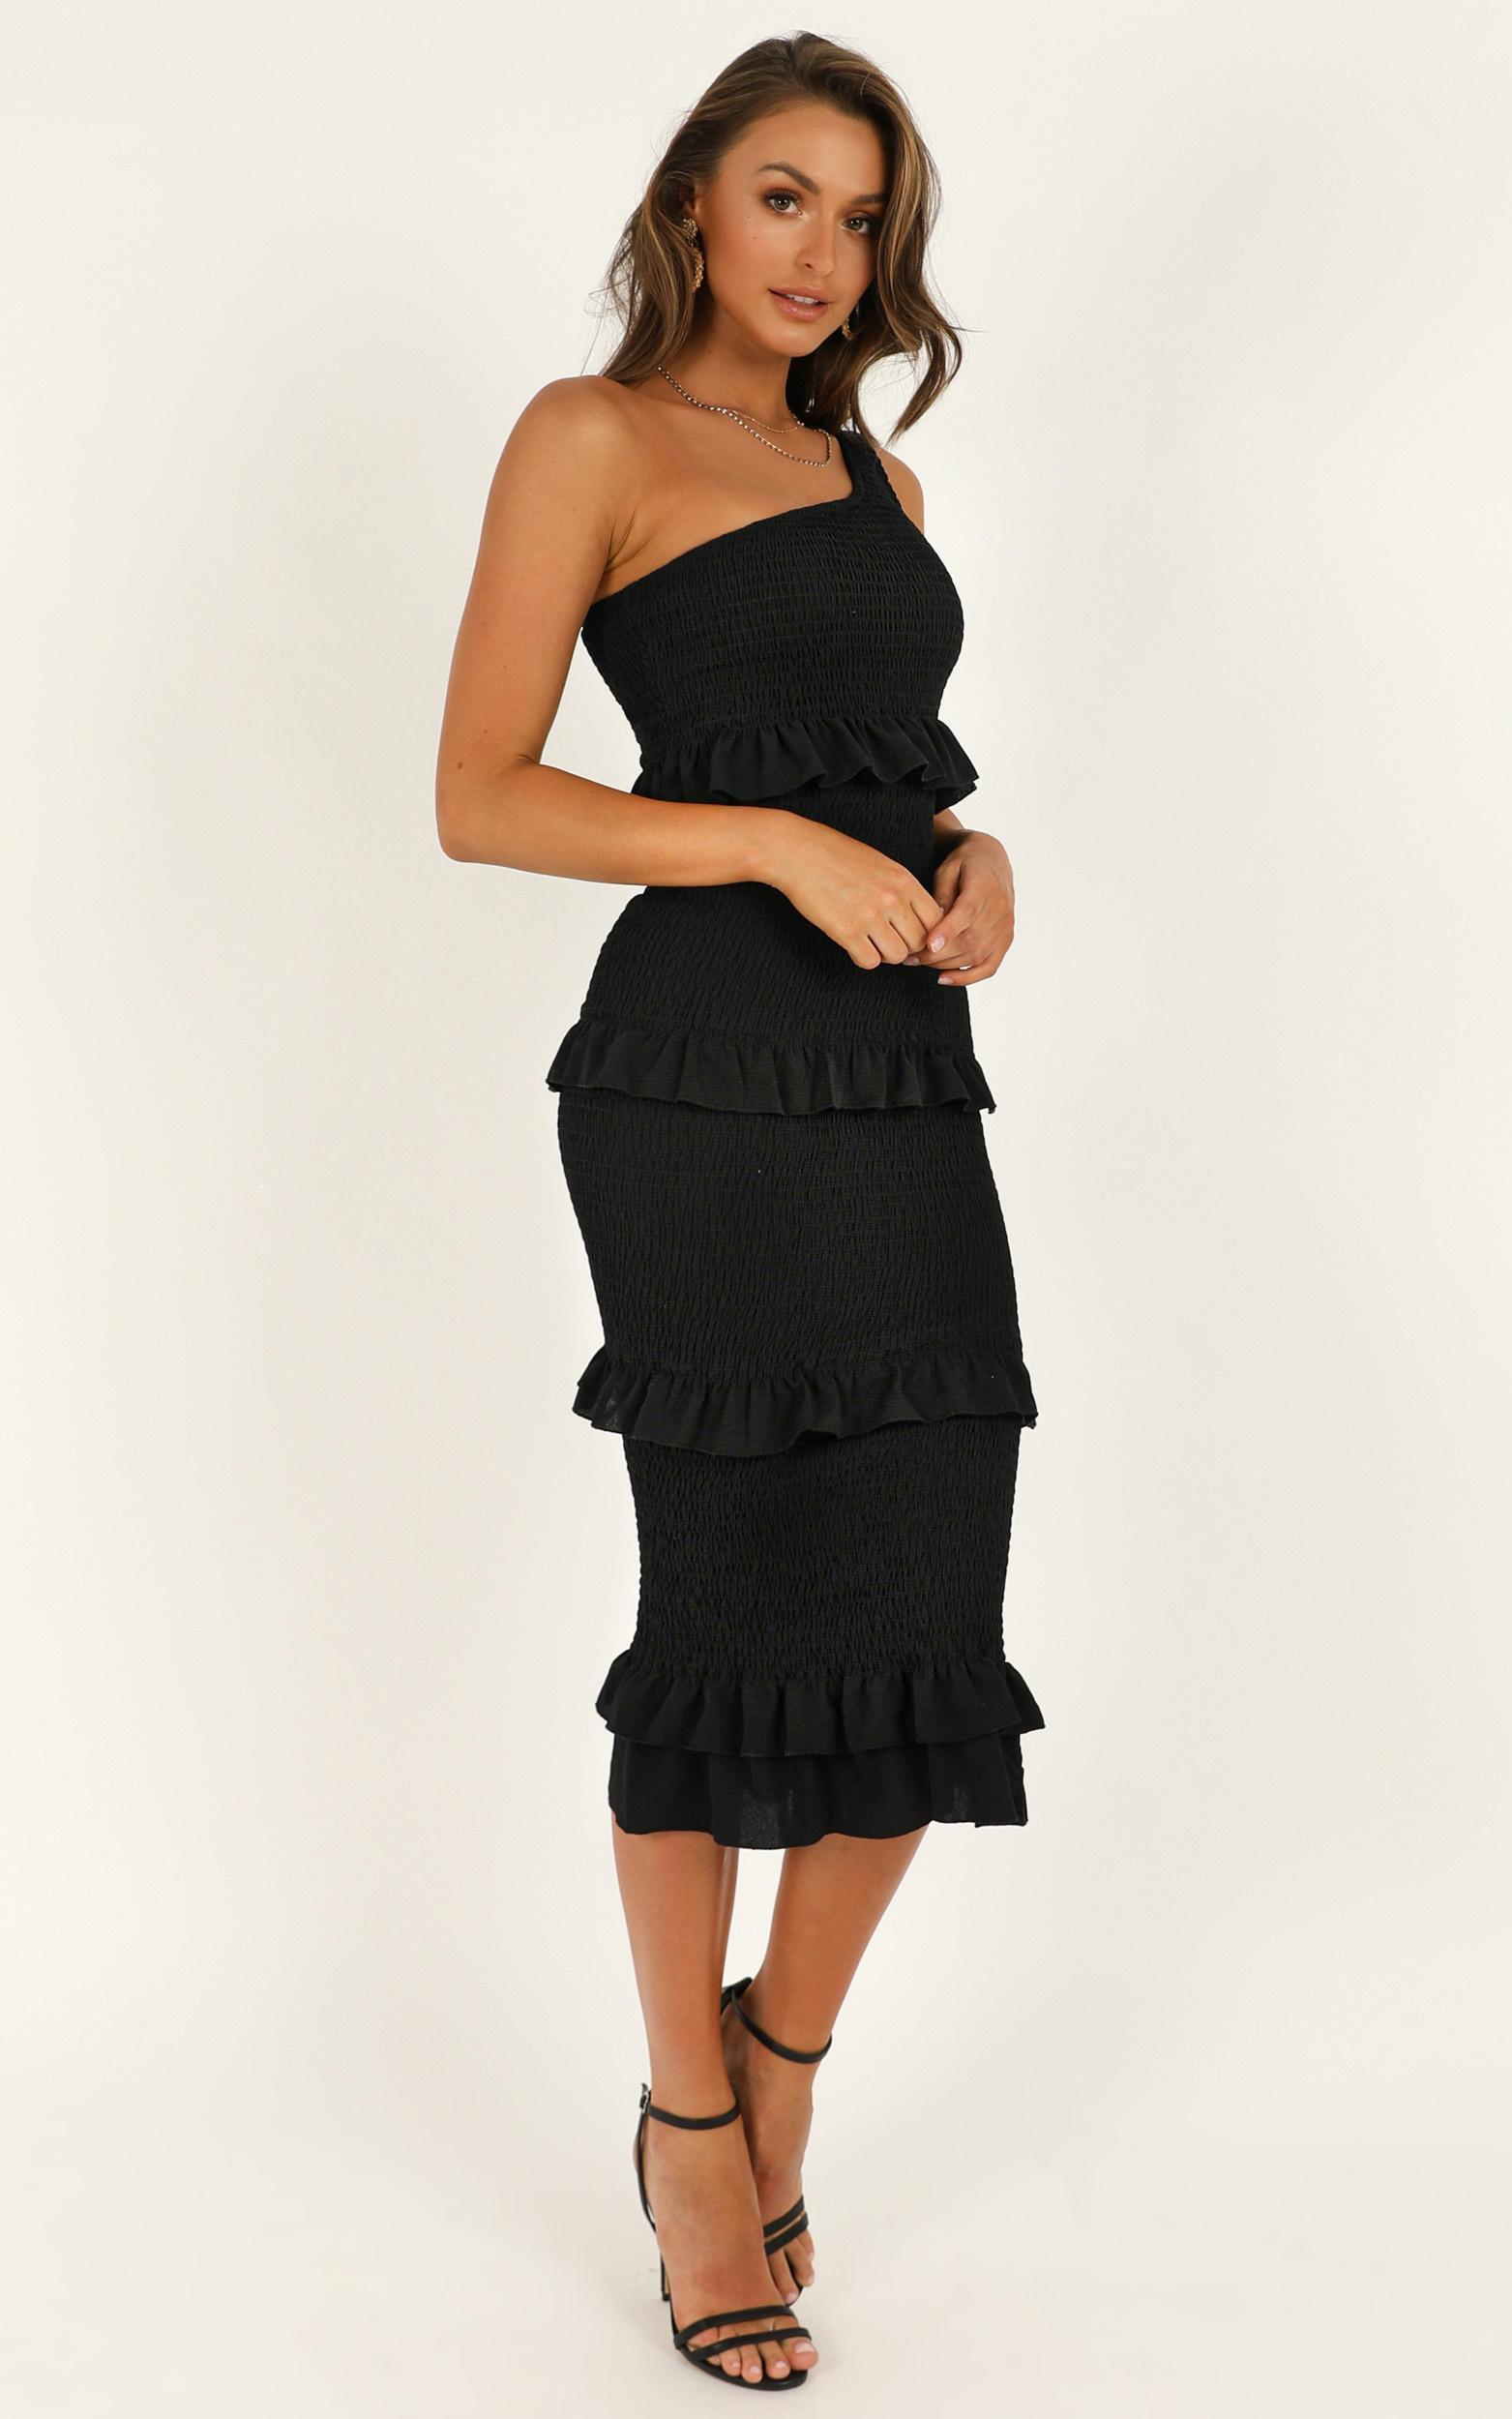 Love So Hard Dress In Black - 16 (XXL), Black, hi-res image number null